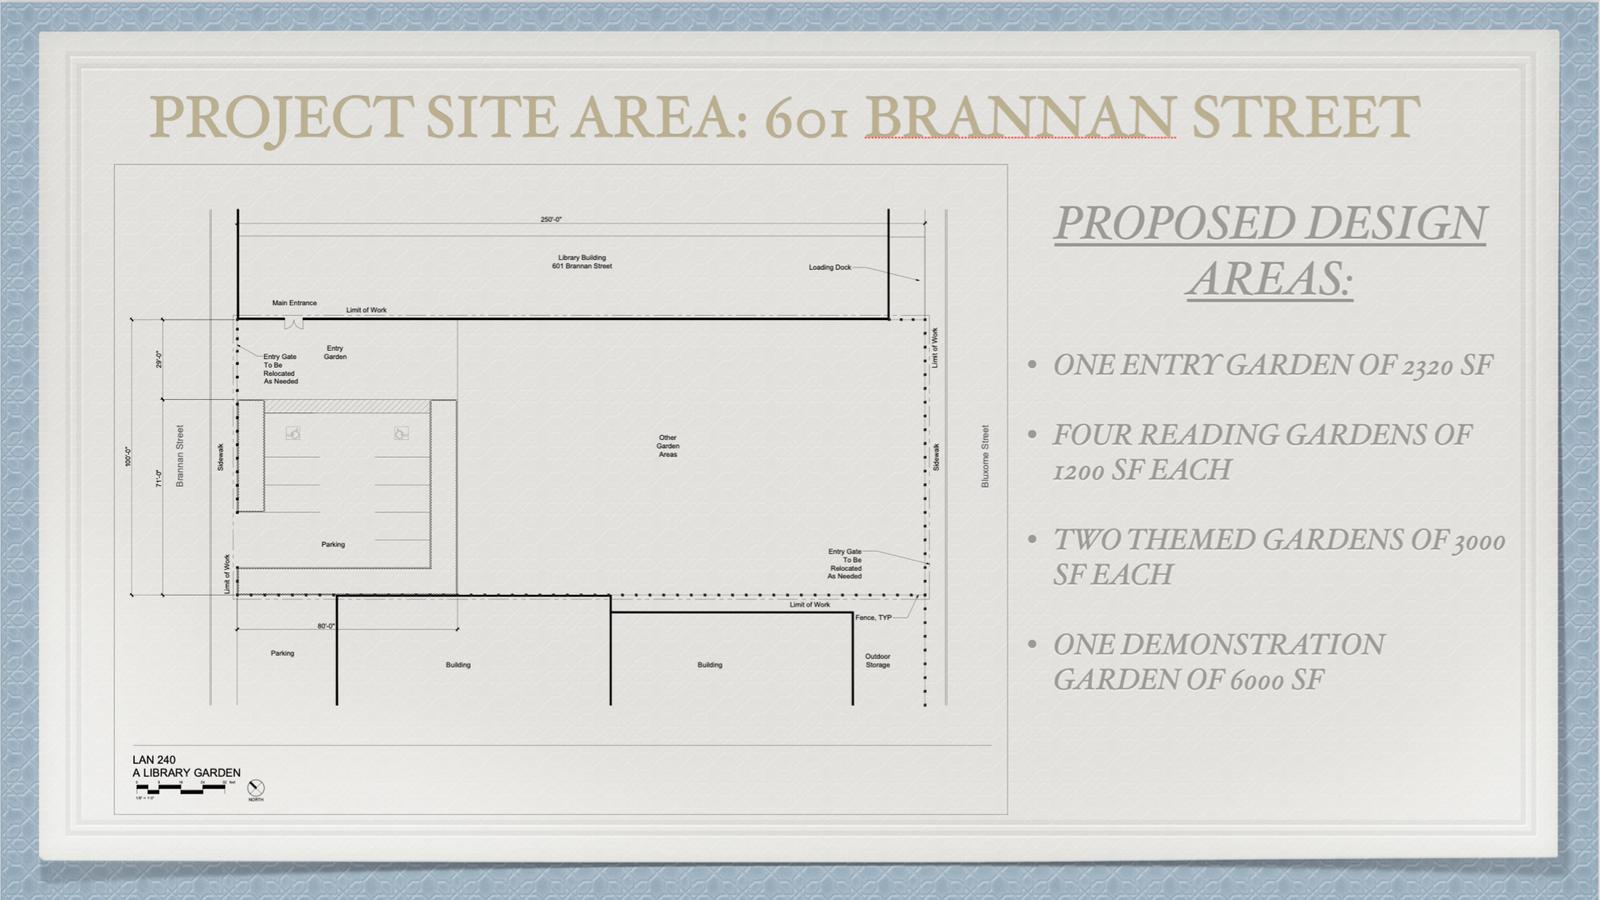 Library Garden for 601 Brannan Street Site 3